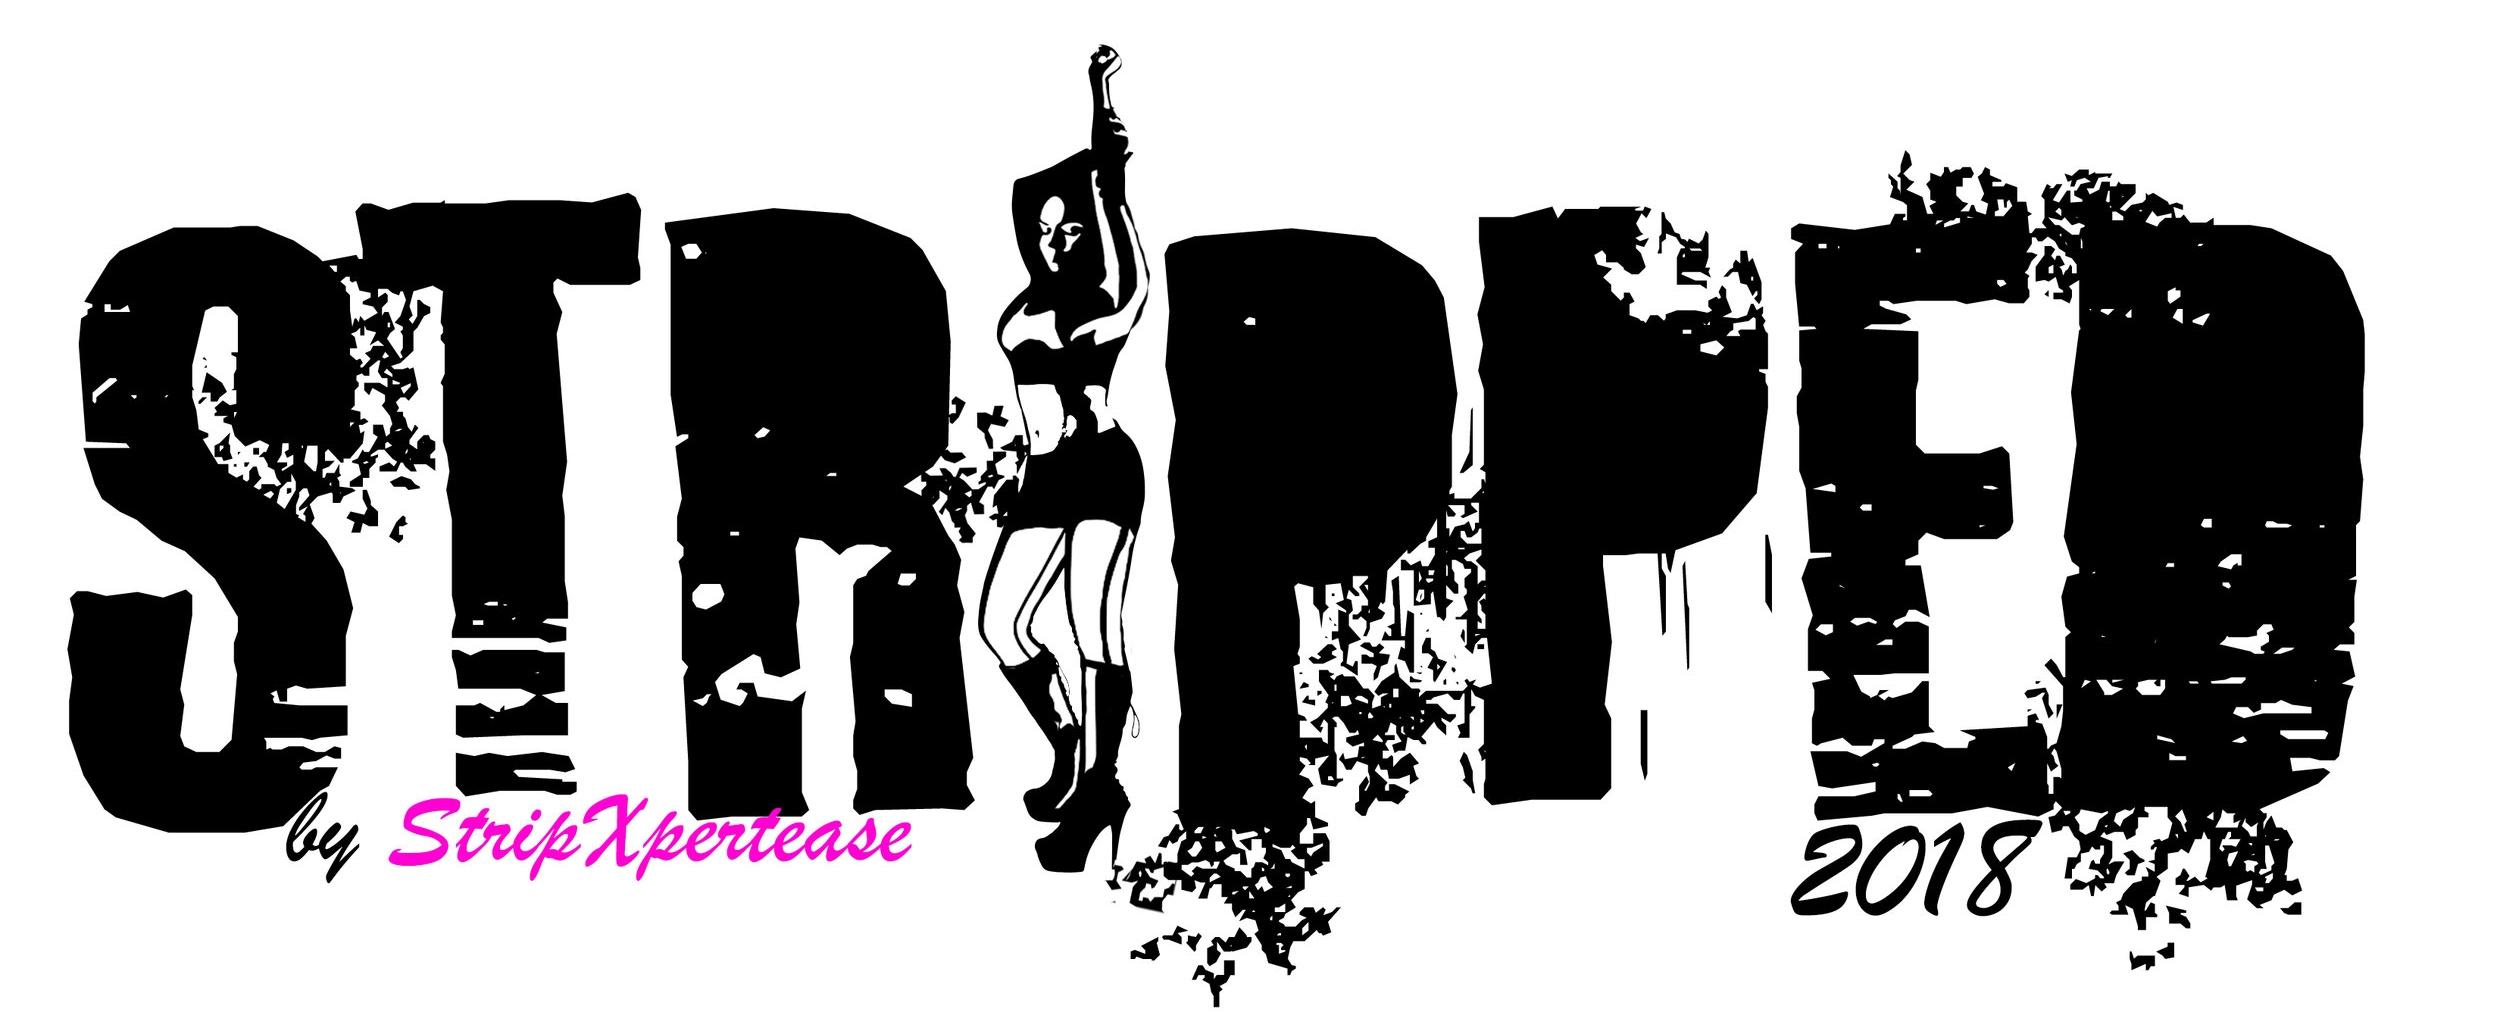 Stripped_1.jpg